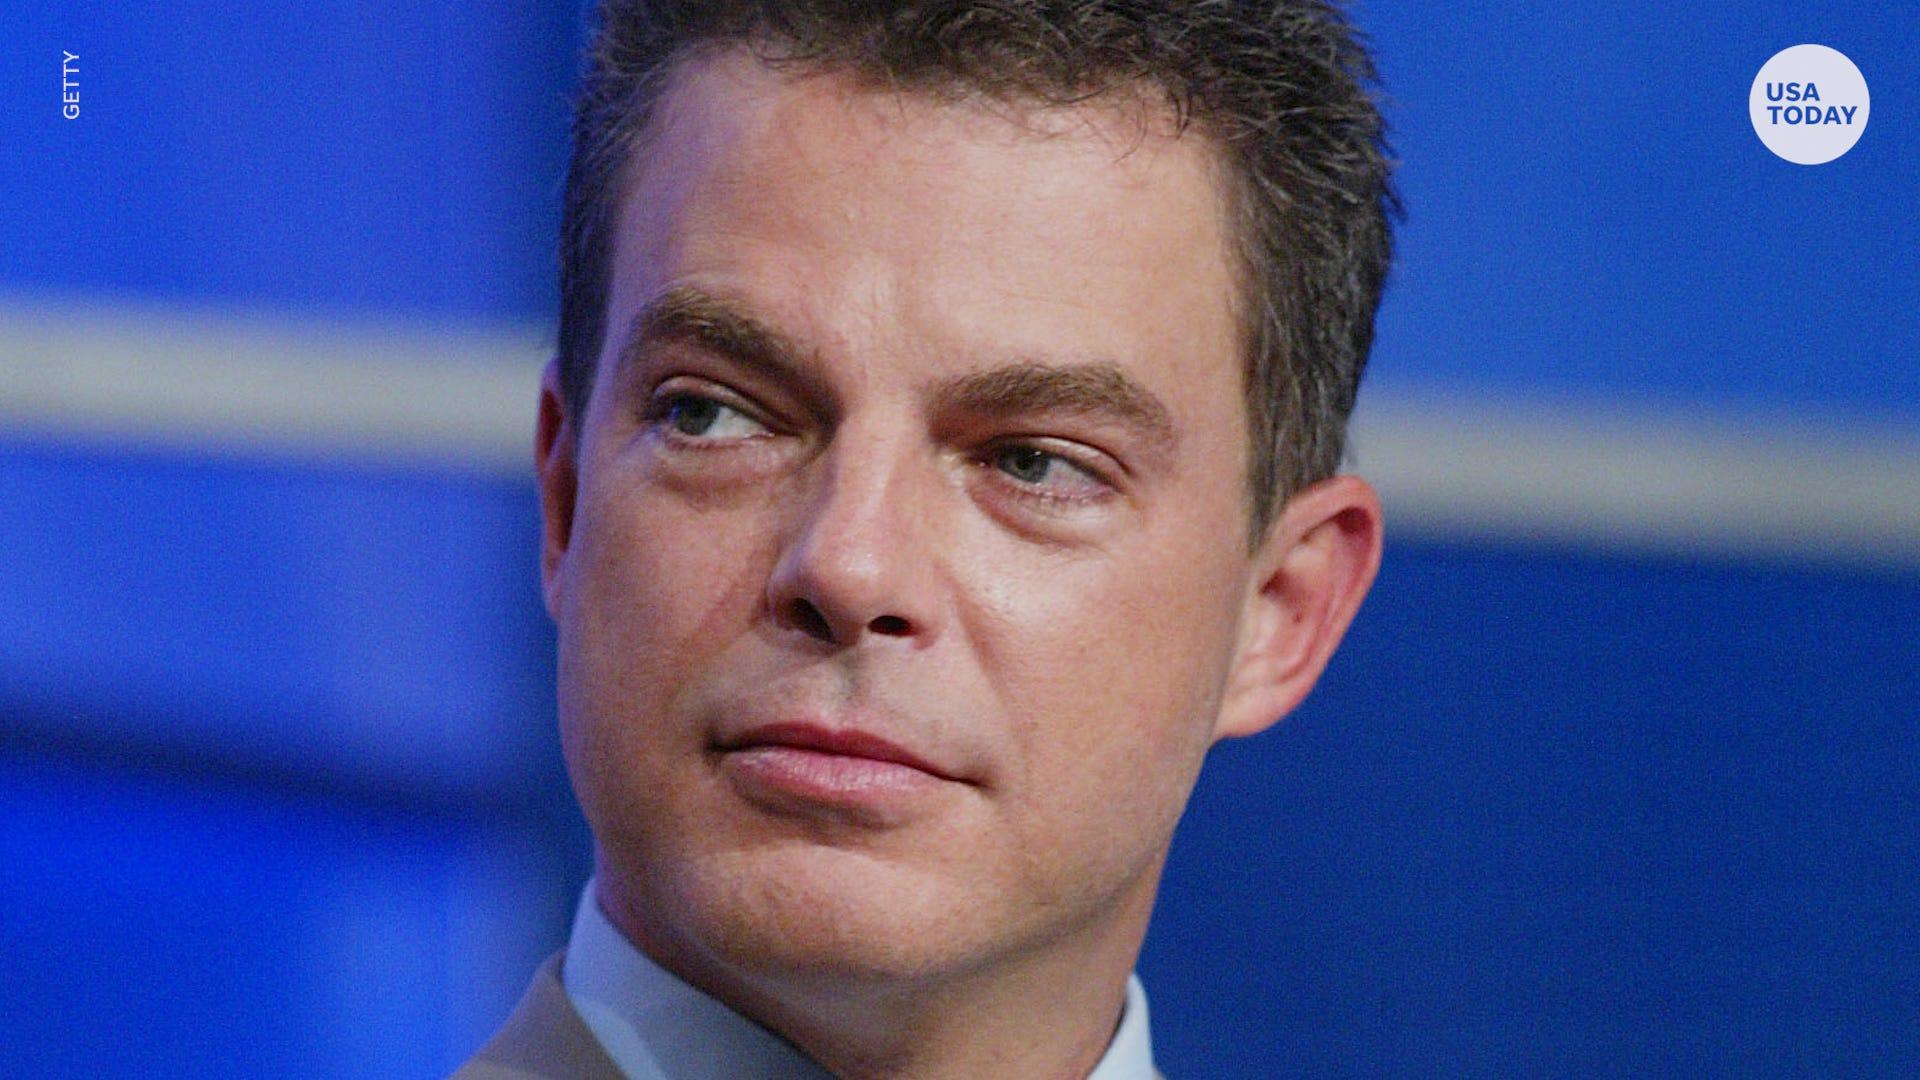 Shepard Smith decries  press vilification  in first speech since leaving Fox News